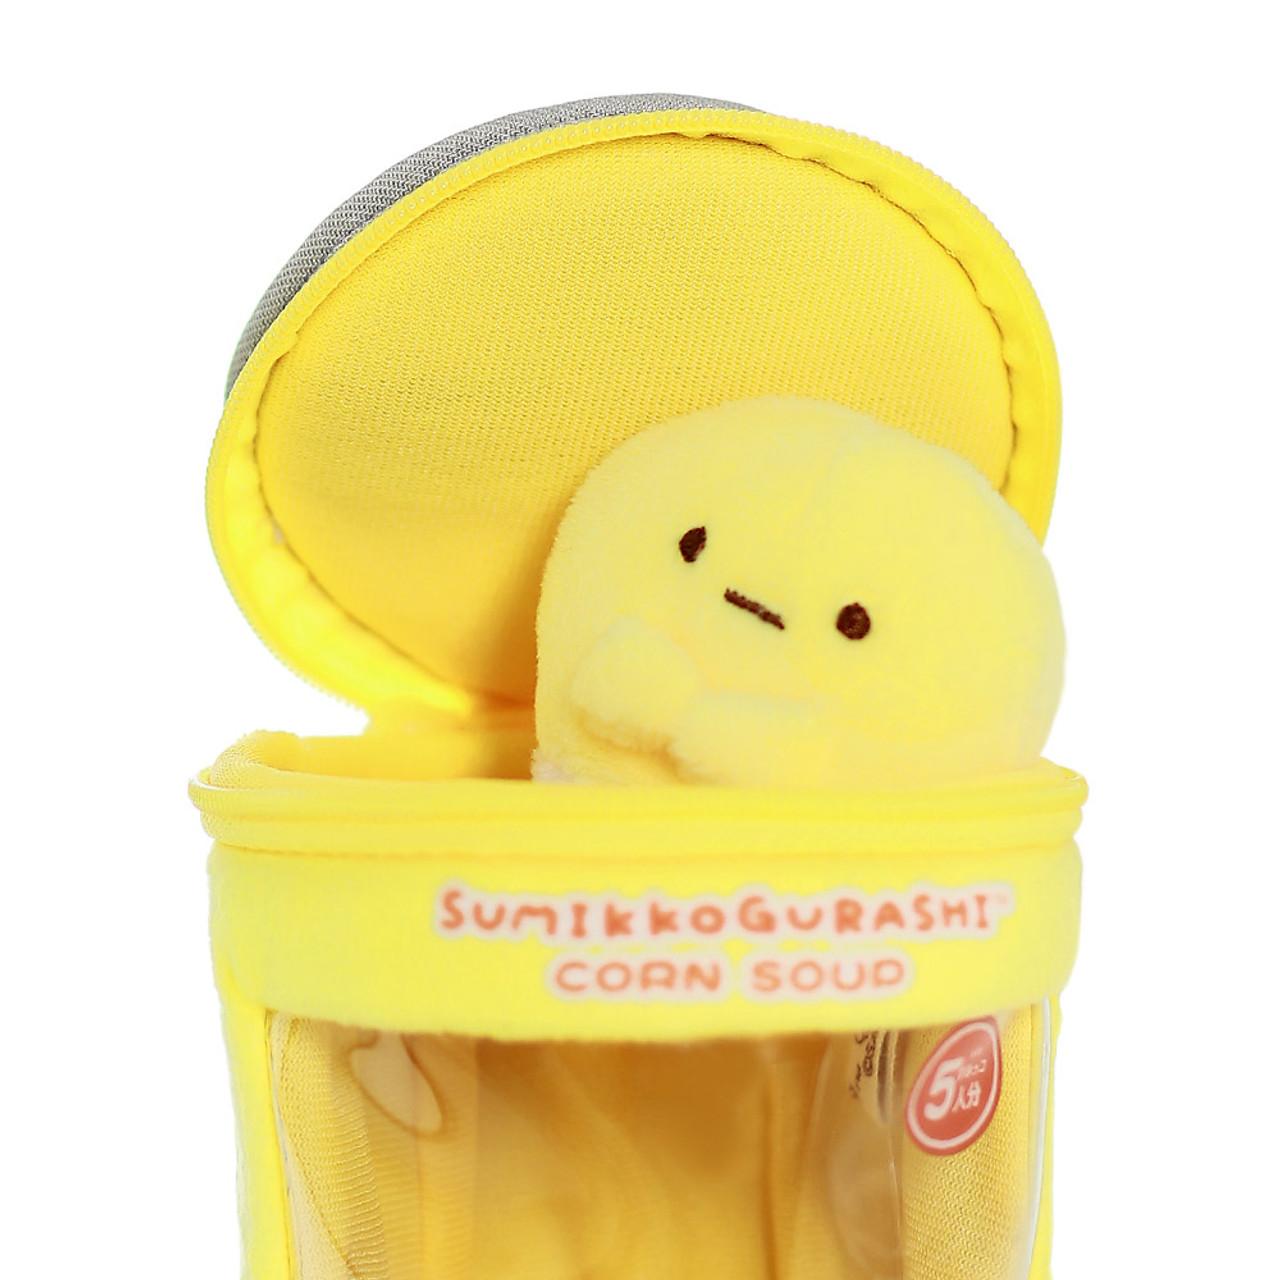 Sumikko Gurashi Premium Corn Can Plush keychain Charm ( Take out from top of the zipper )